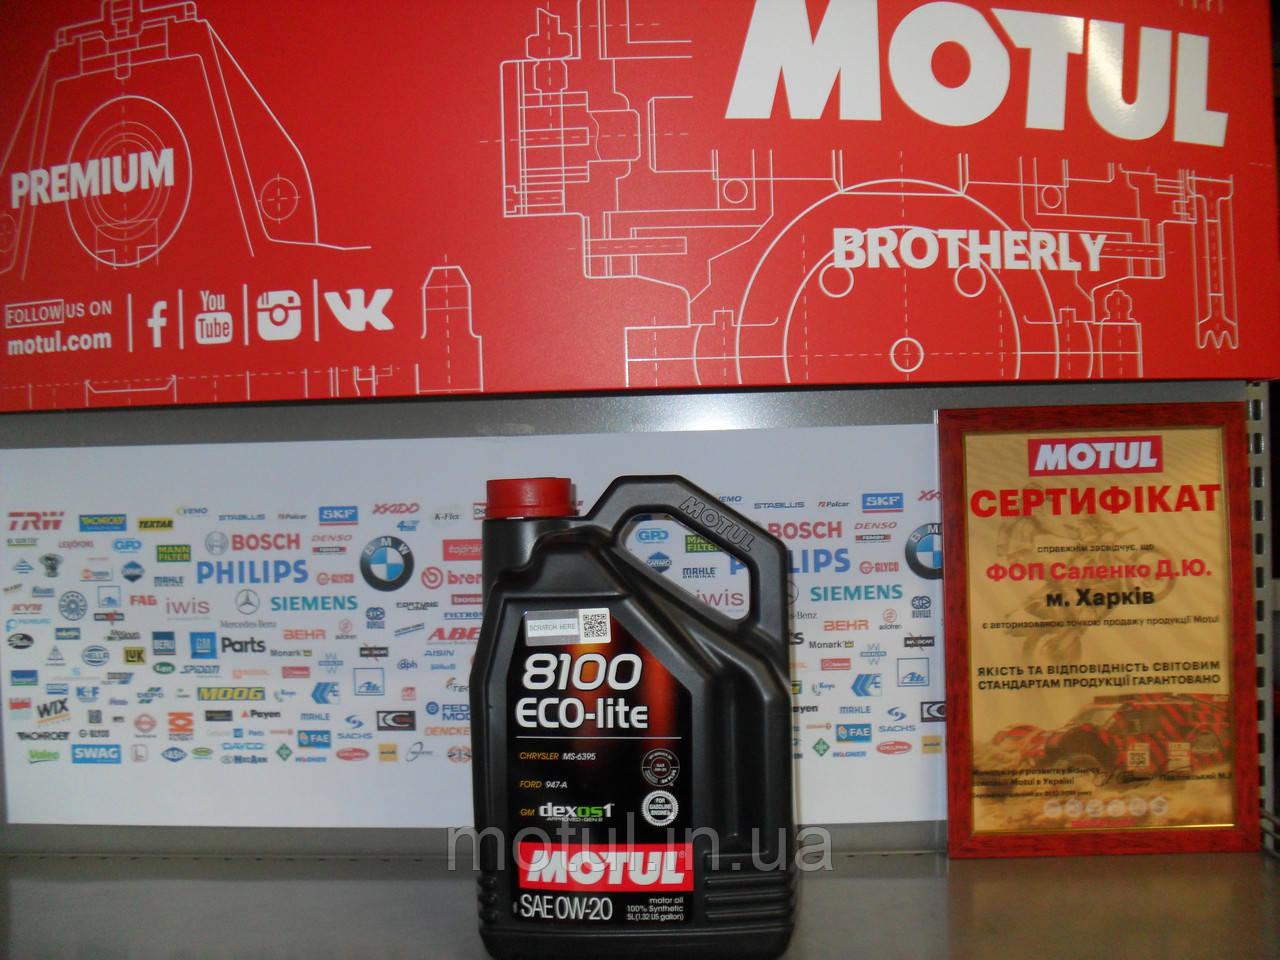 Моторное масло Motul 8100 eco-lite 0W20 5L